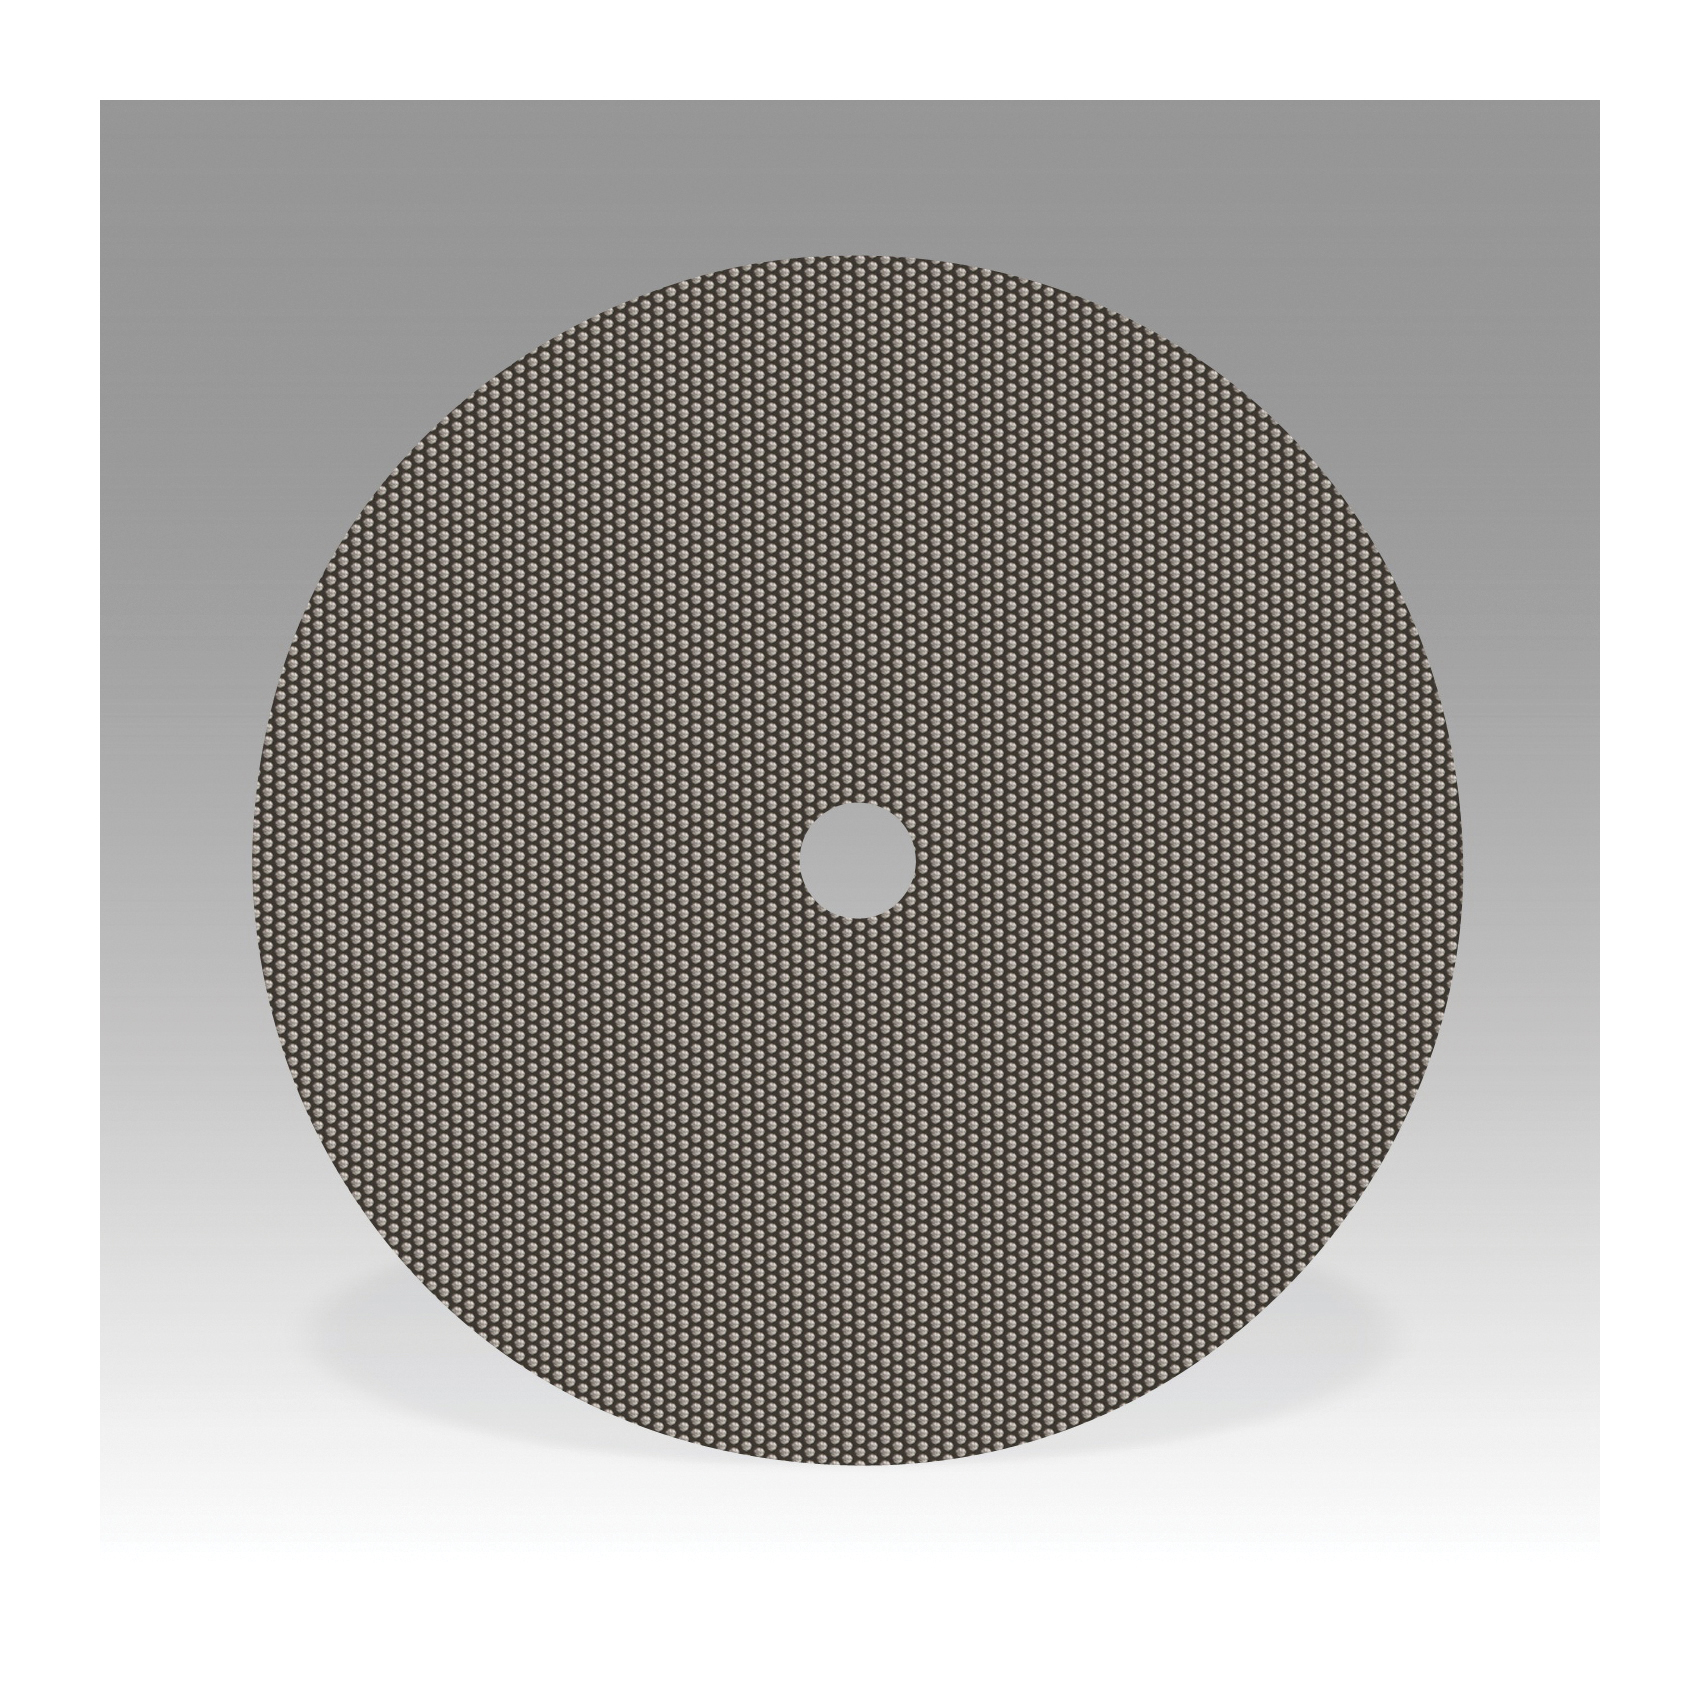 3M™ 051144-80206 6002J Flexible Coated Abrasive Disc, 5 in Dia, 1 in Arbor/Shank, M250 Grit, Medium Grade, Diamond Abrasive